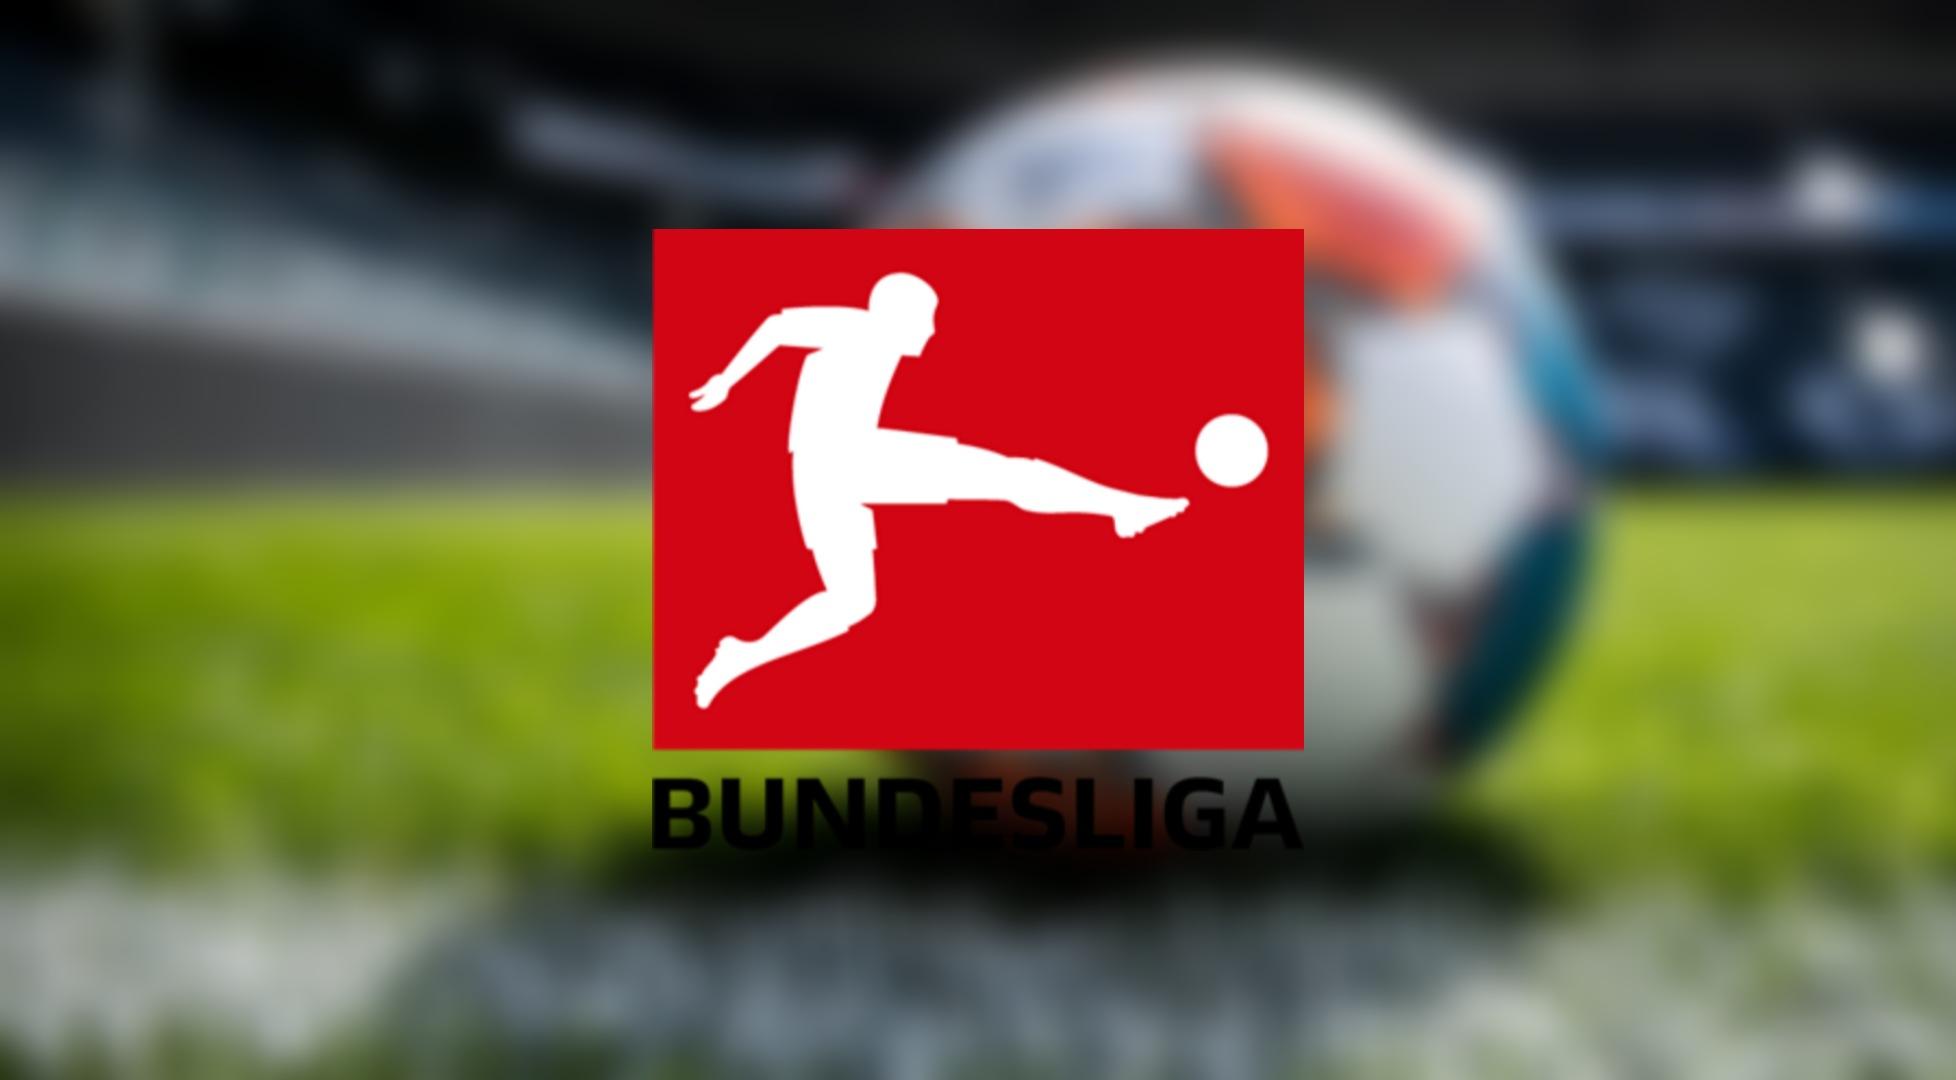 Jadual Bundesliga Jerman 2021/2022 Waktu Malaysia (Keputusan)